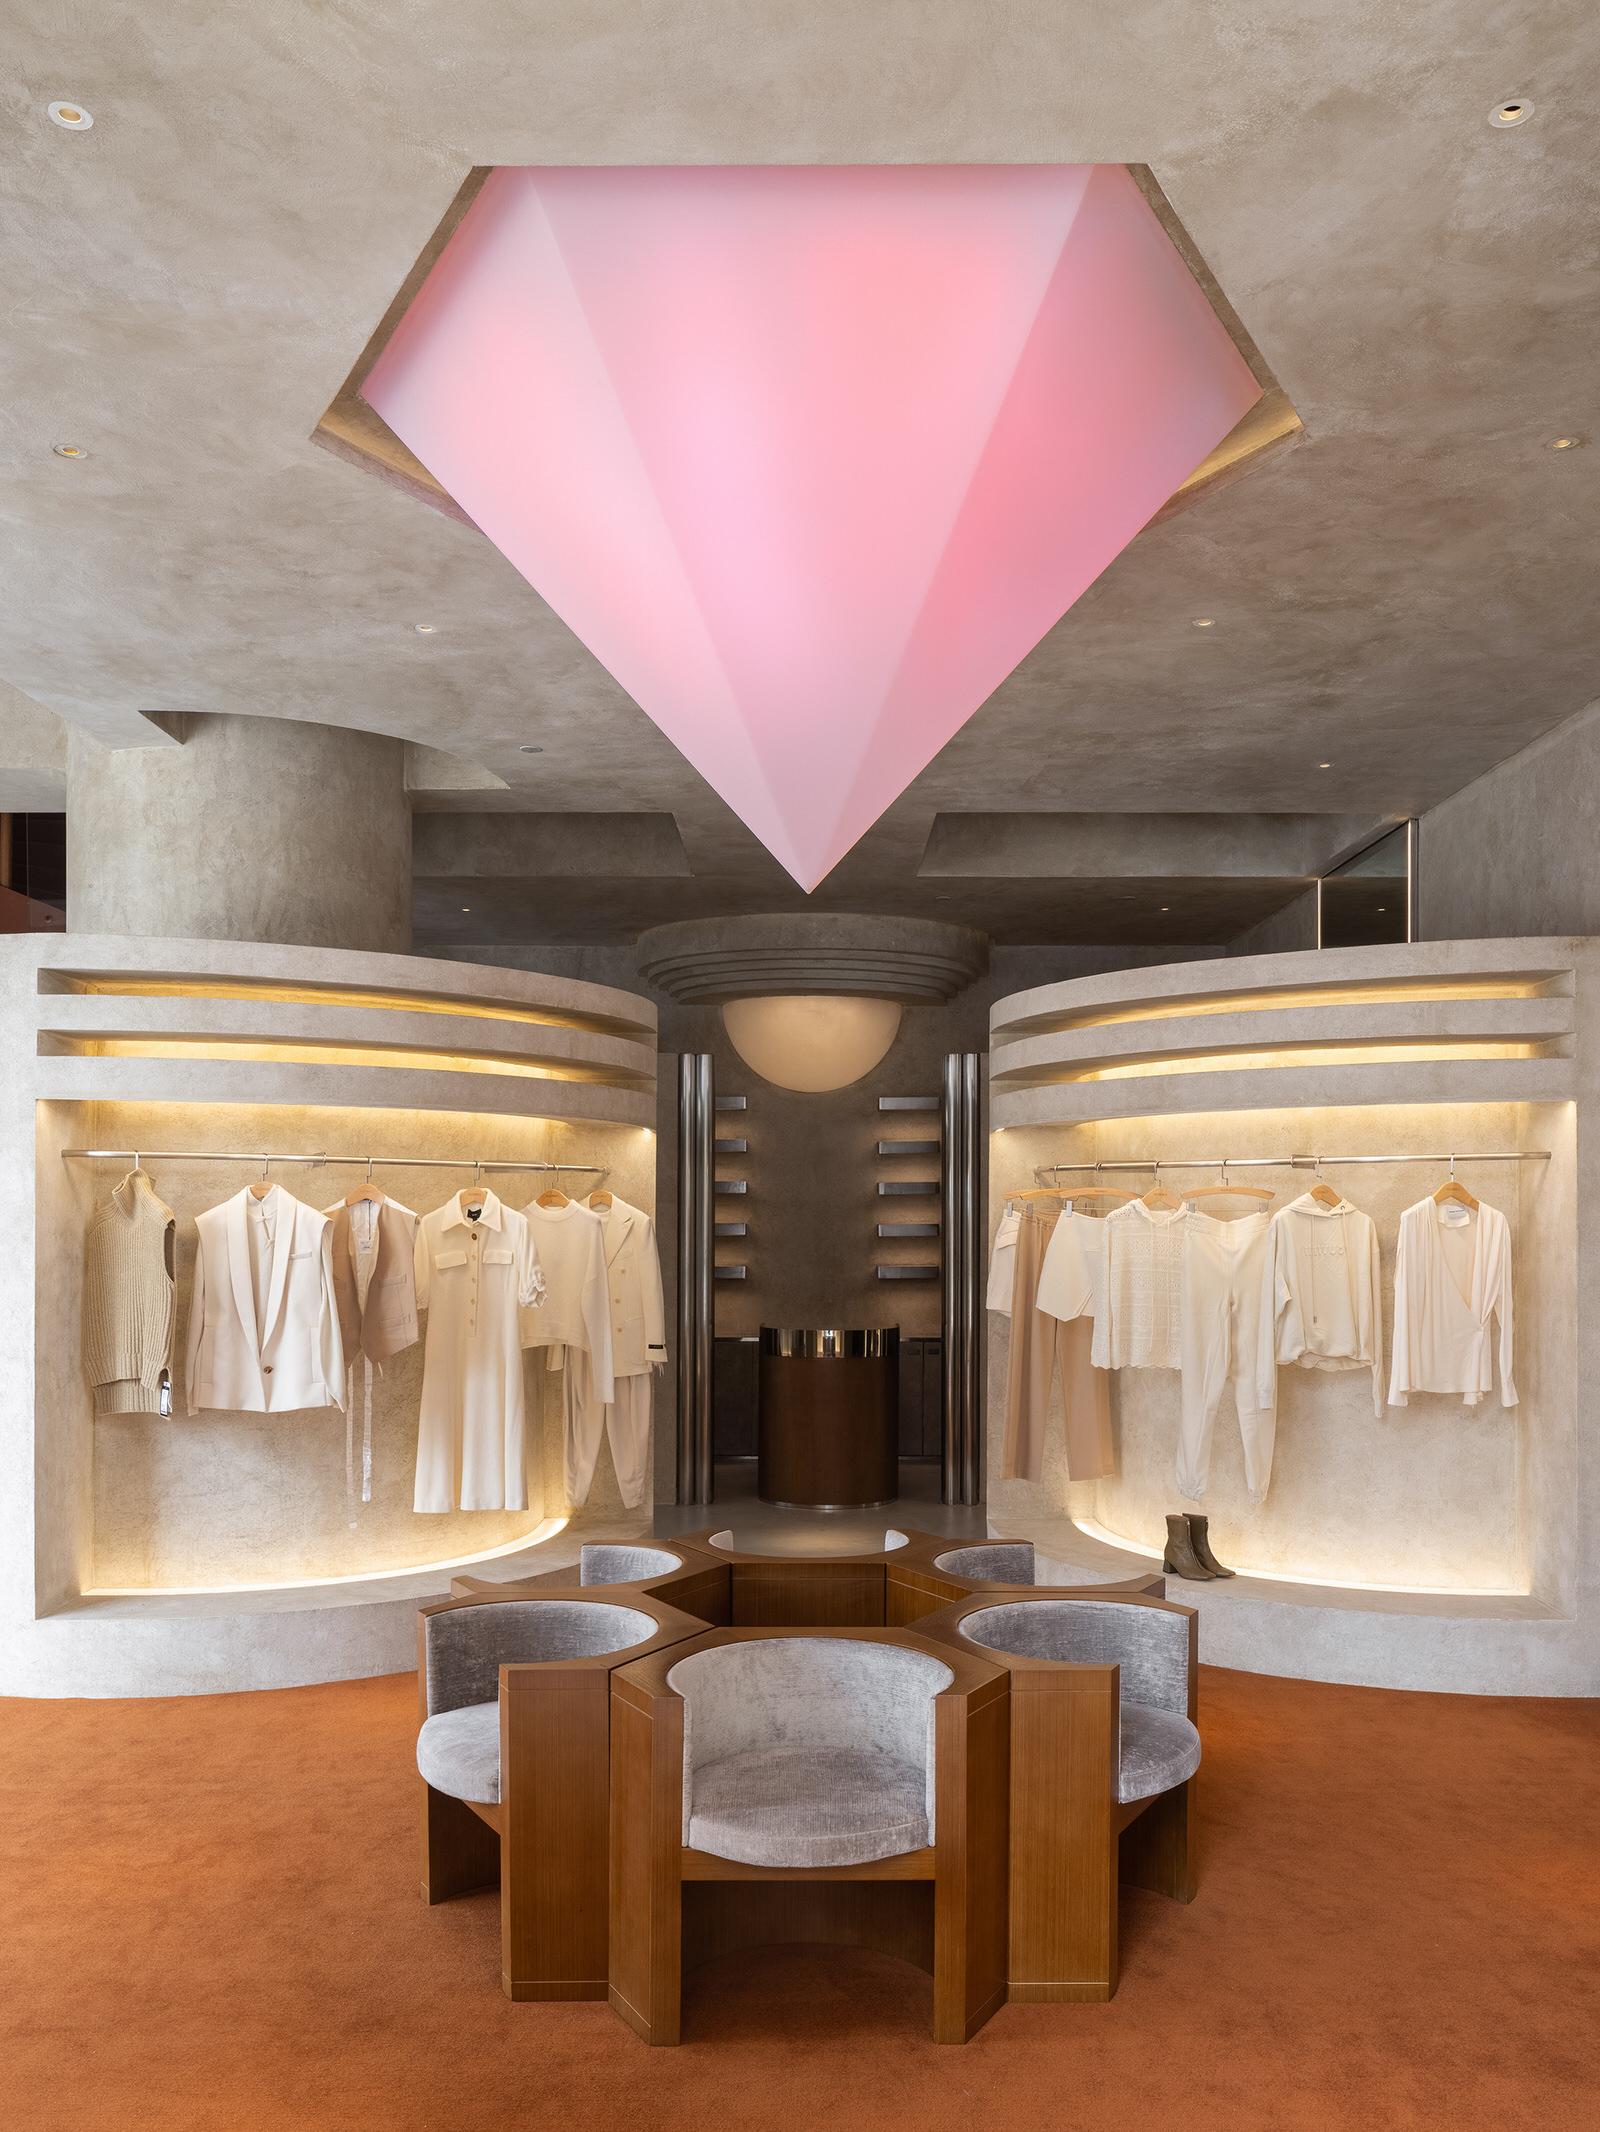 Liang Architecture Studio Audrey Boutique Hangzhou China Luxury Retail Photo Shao Feng Yellowtrace 01